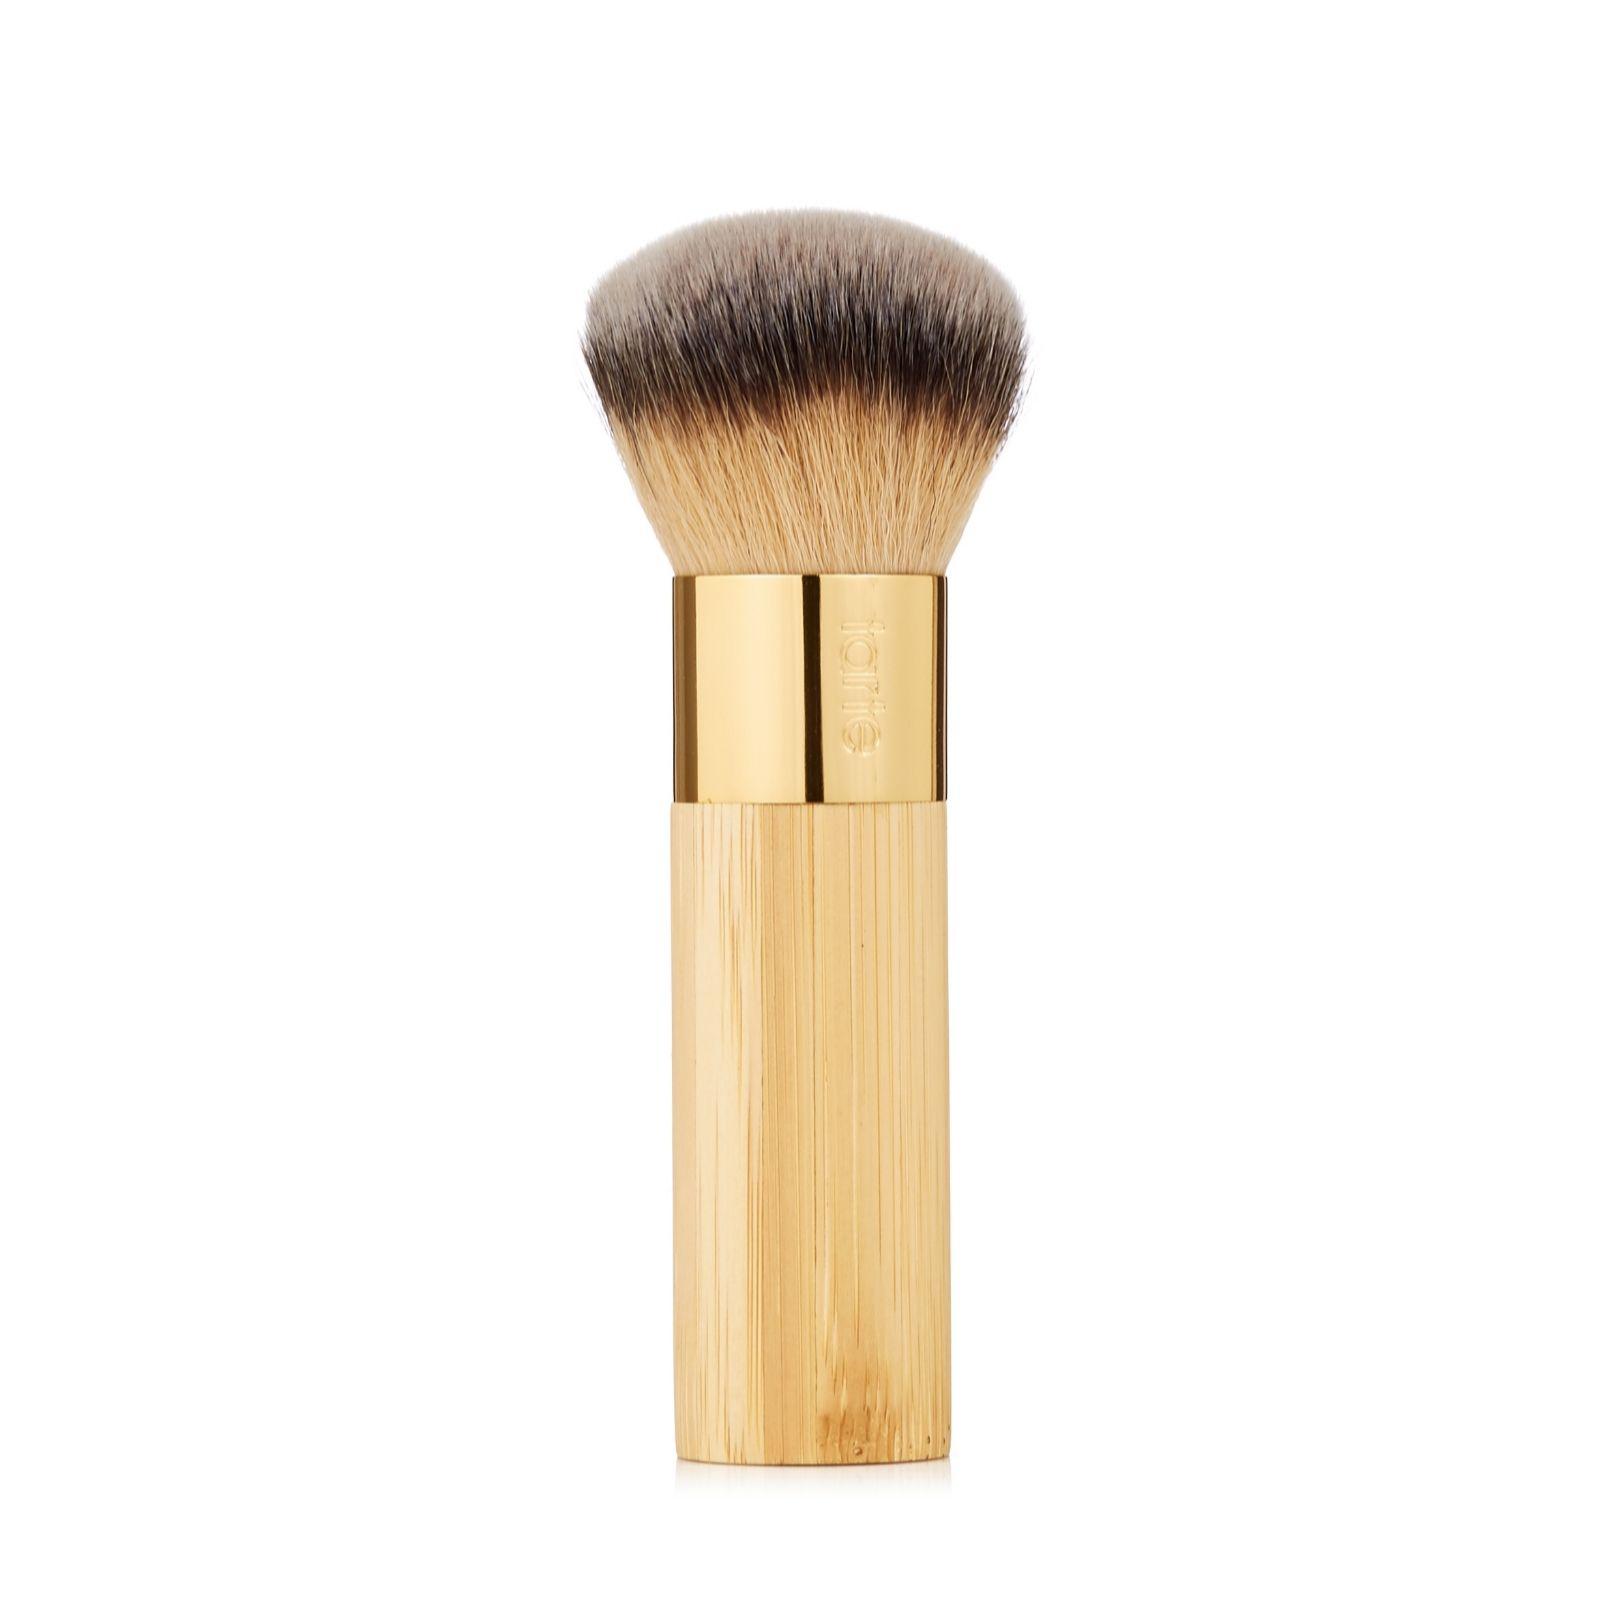 TarteAirbrush Finish Bamboo Foundation Brush, Affordable Gel Manicure Hack